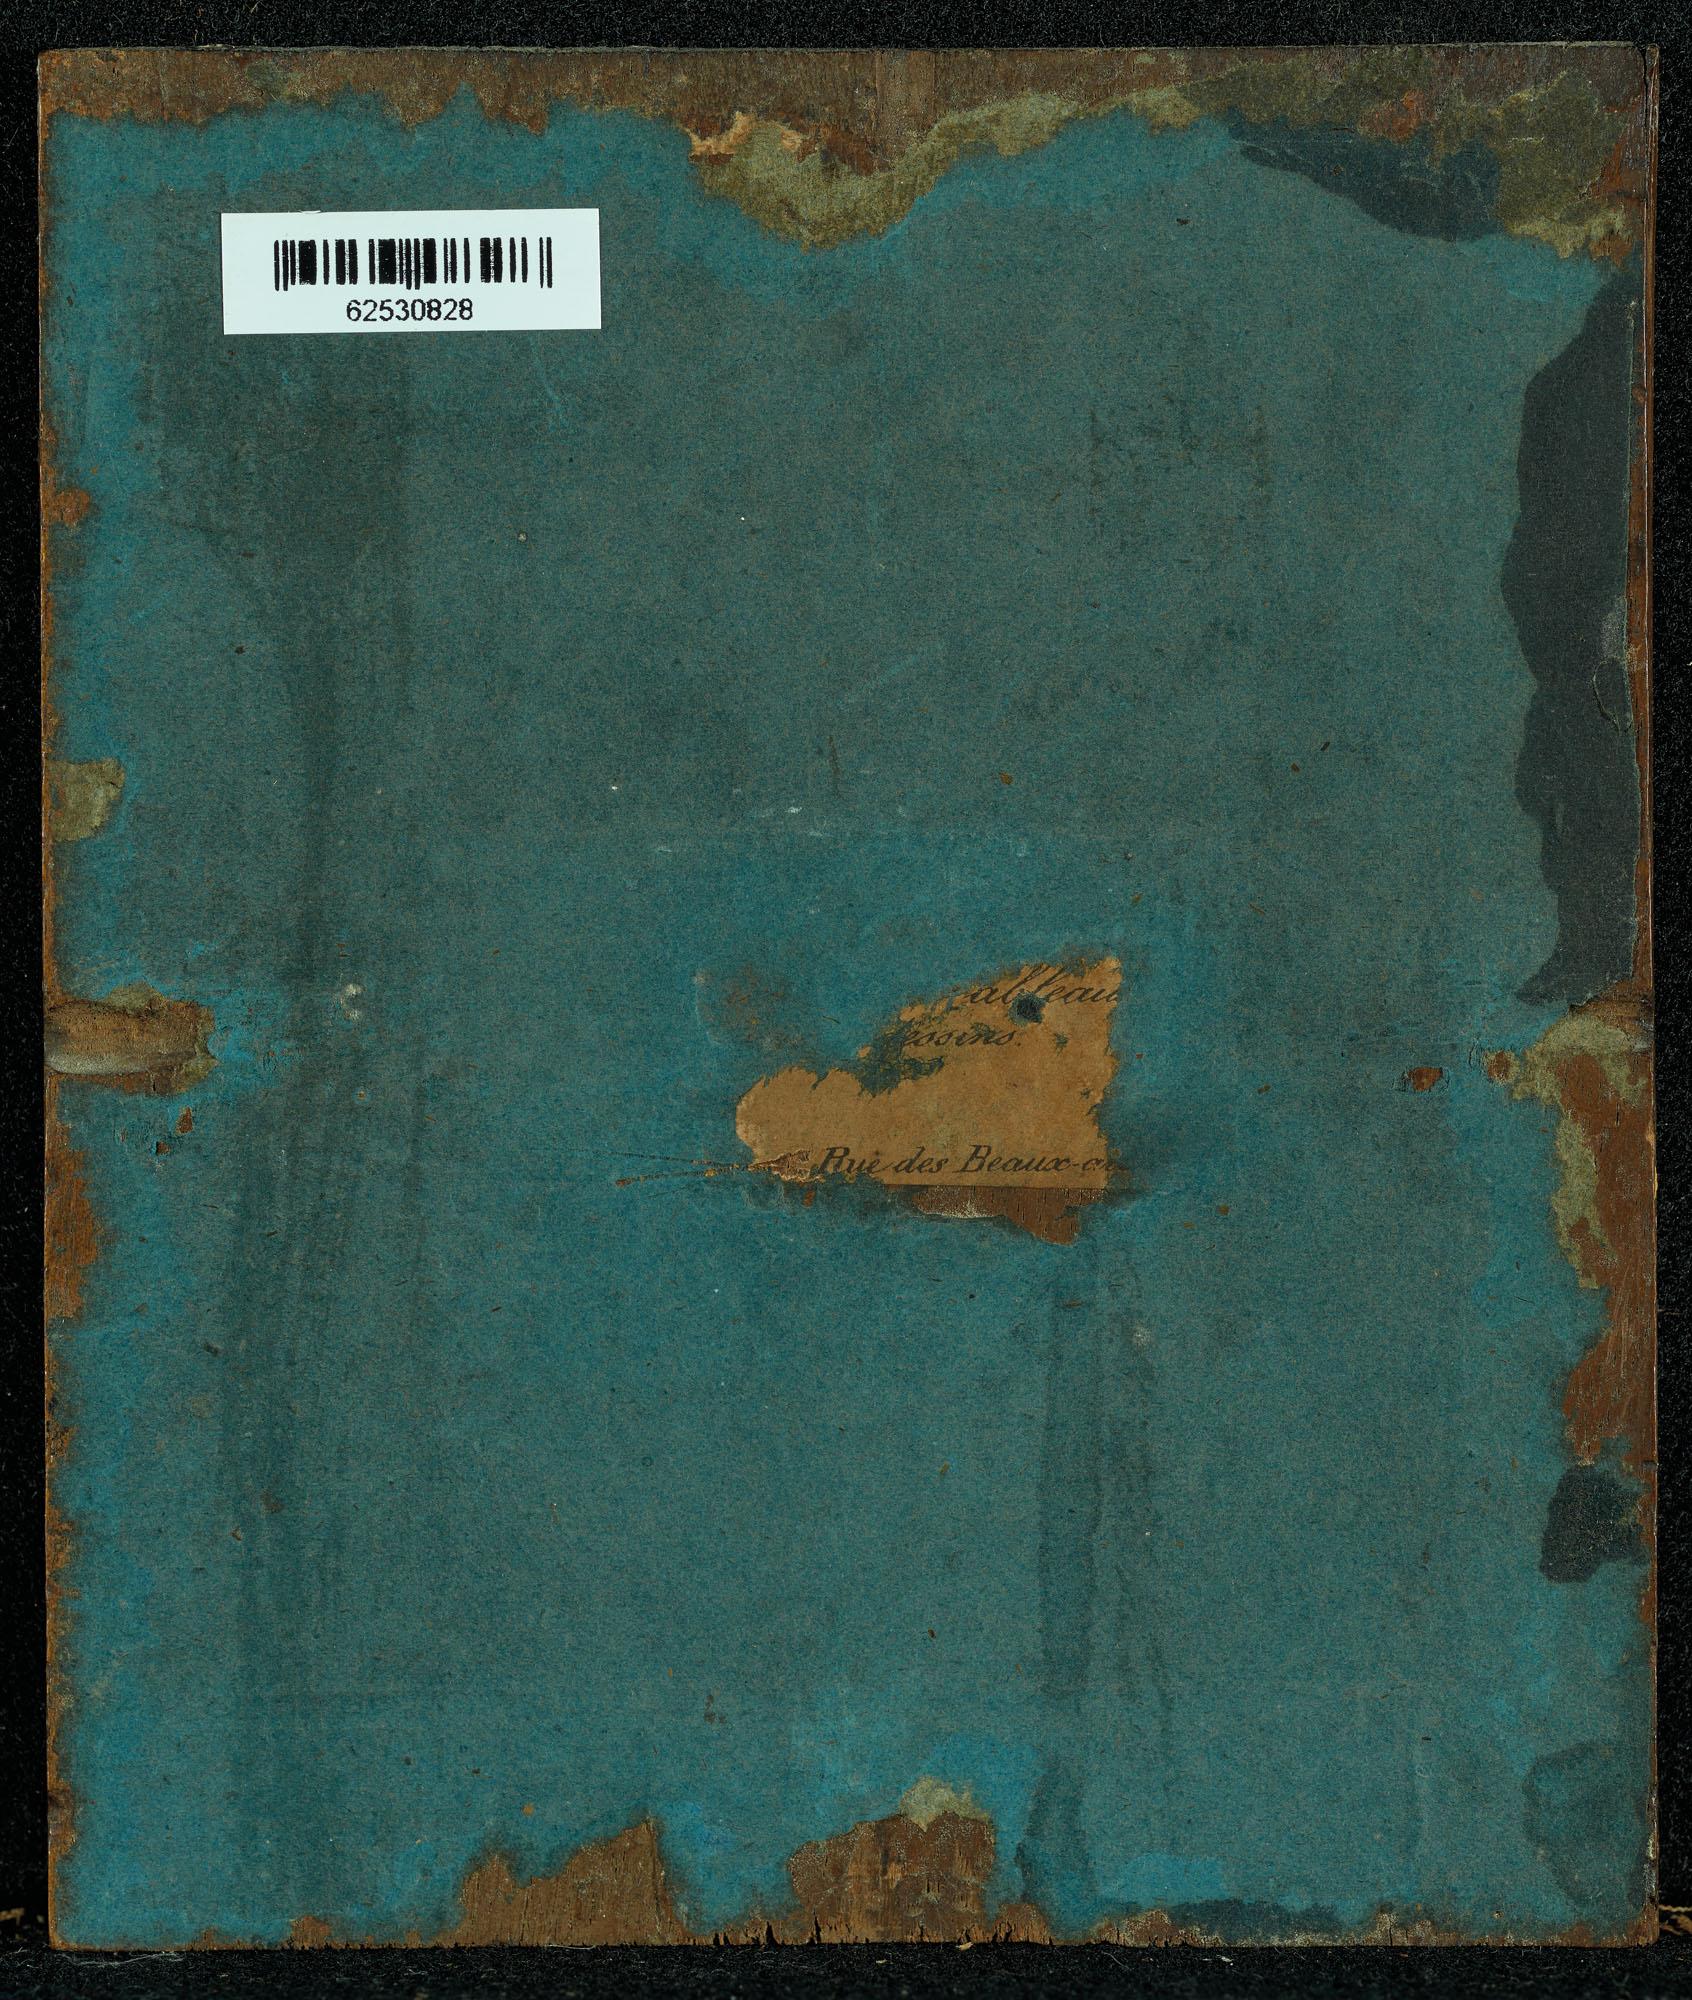 CORNEILLE DE LA HAYE DIT CORNEILLE DE LYON (LA HAYE 1500/1510-1575 LYON)